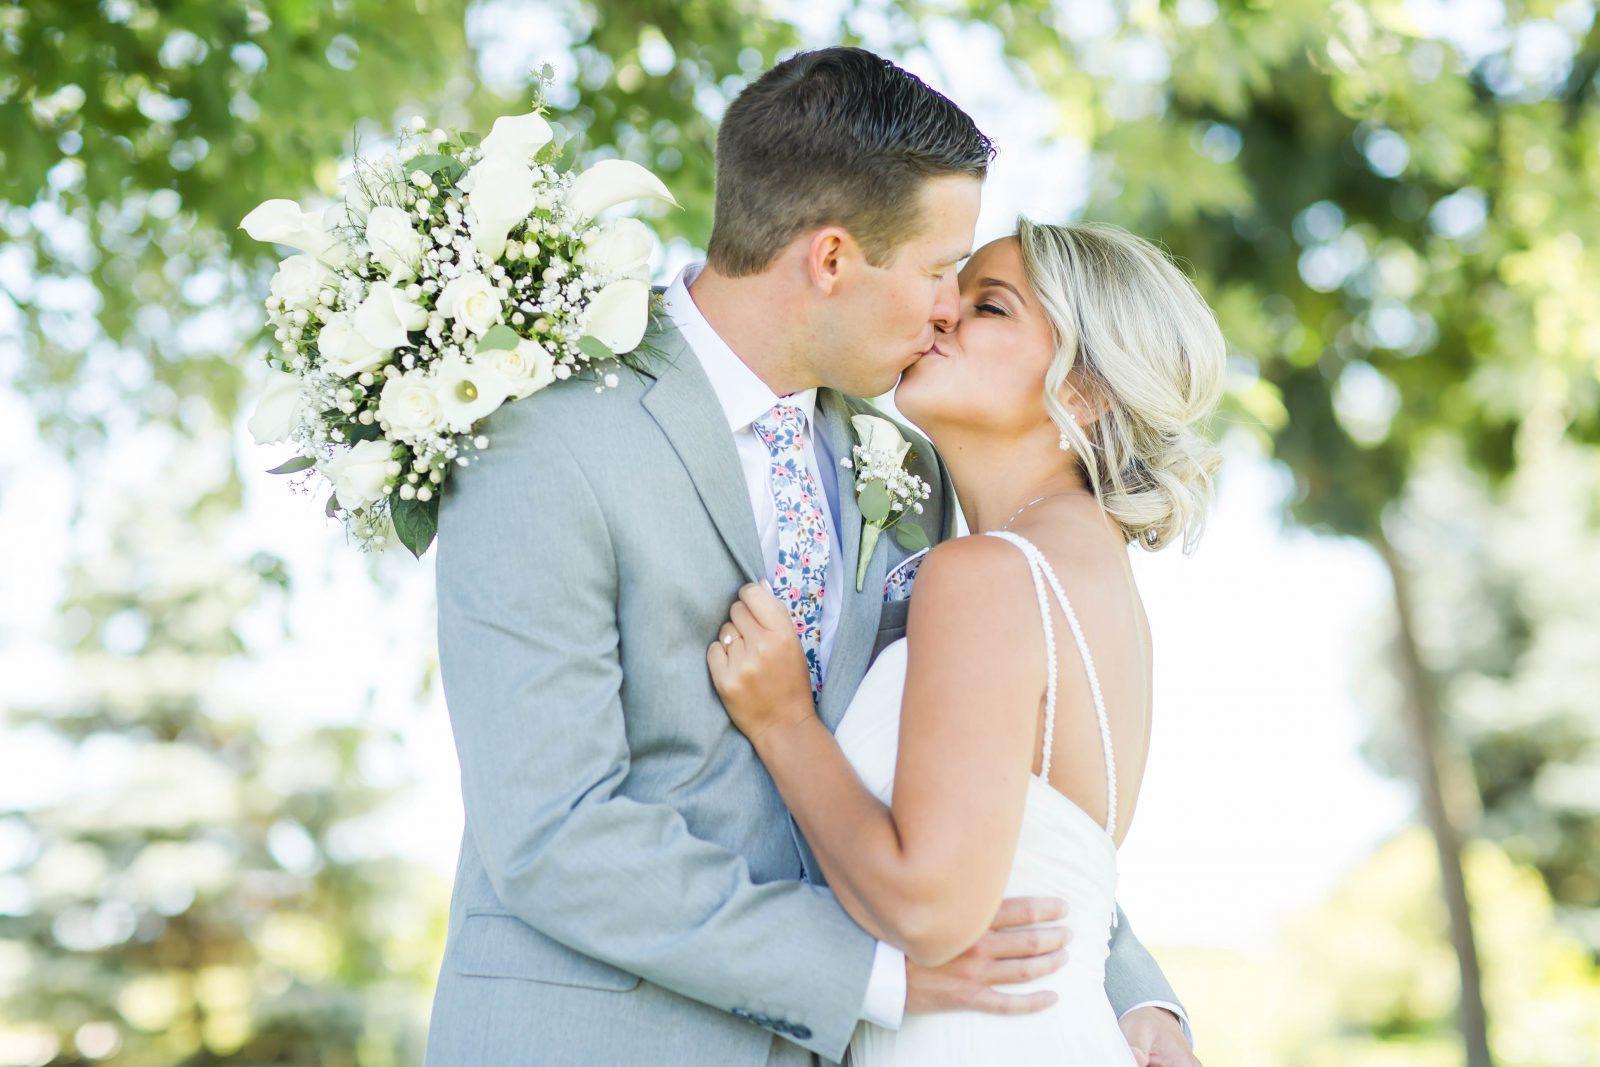 peacock-ridge-summer-wedding-photographer-akron-ohio-loren-jackson-photography-45